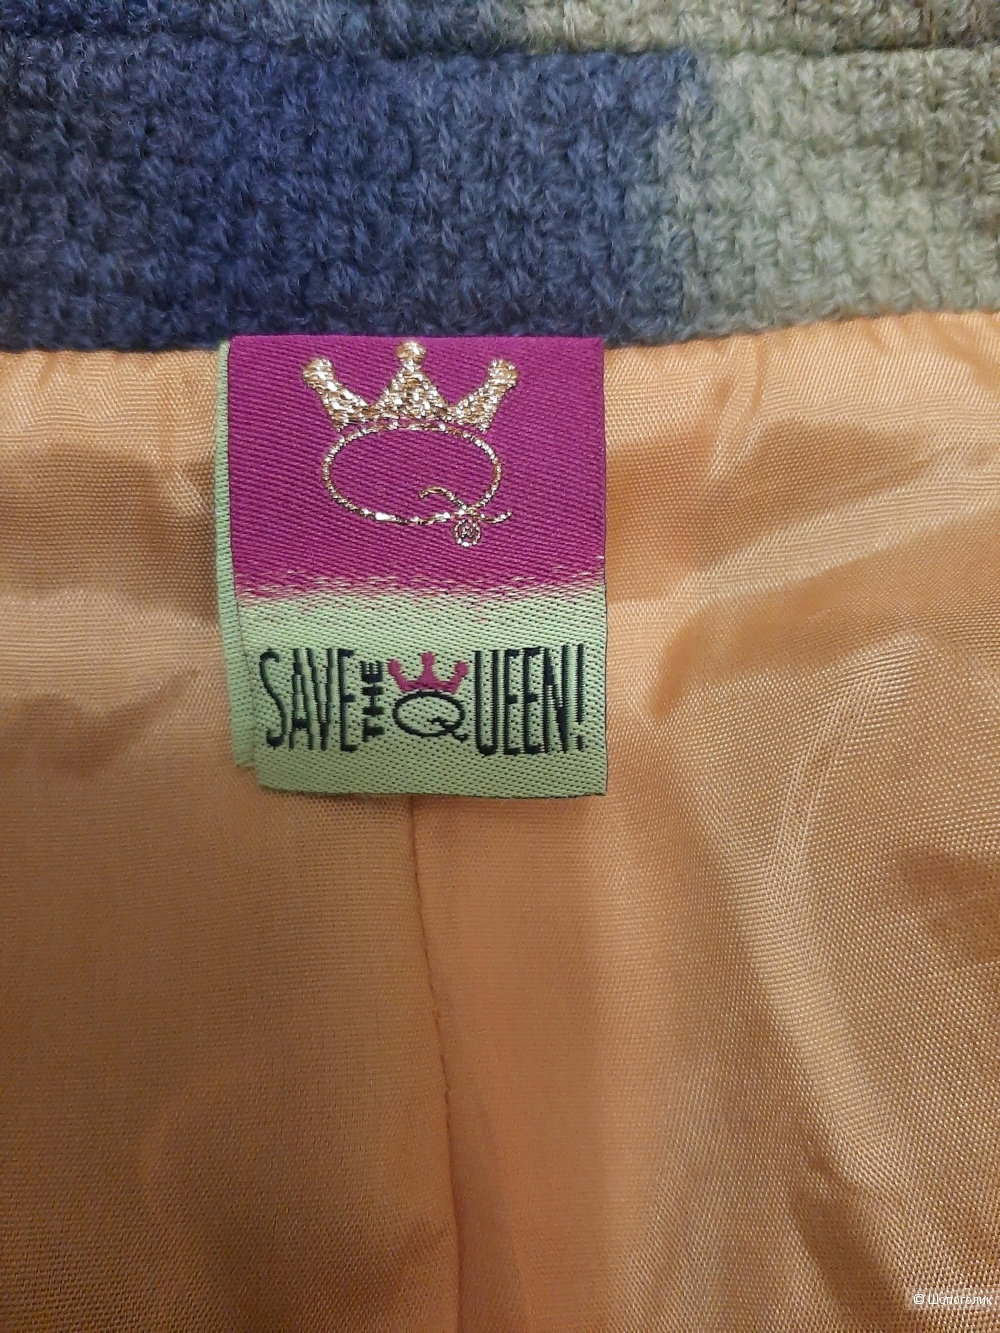 Пальто Save the Queen, размер XS